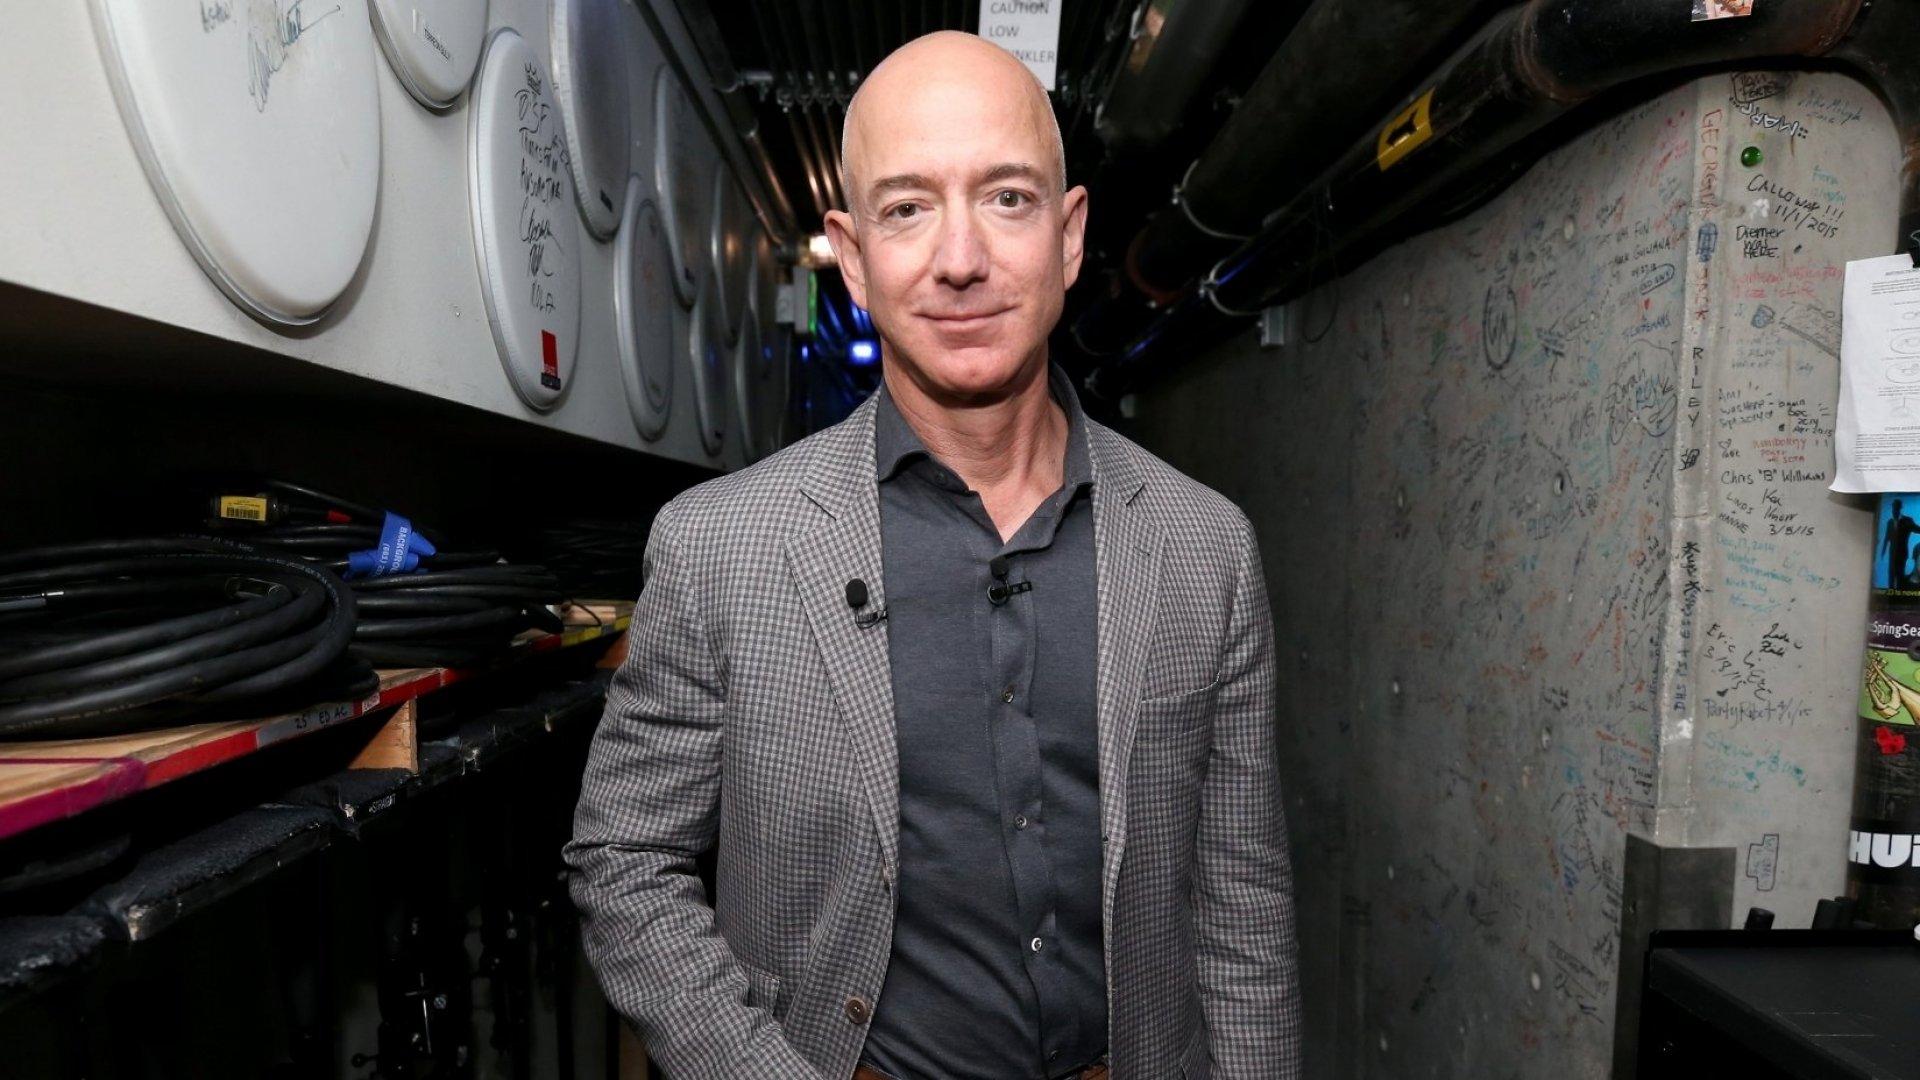 Jeff Bezos Wants to Know Where to Donate His Money. This 1 Idea Makes Perfect Sense